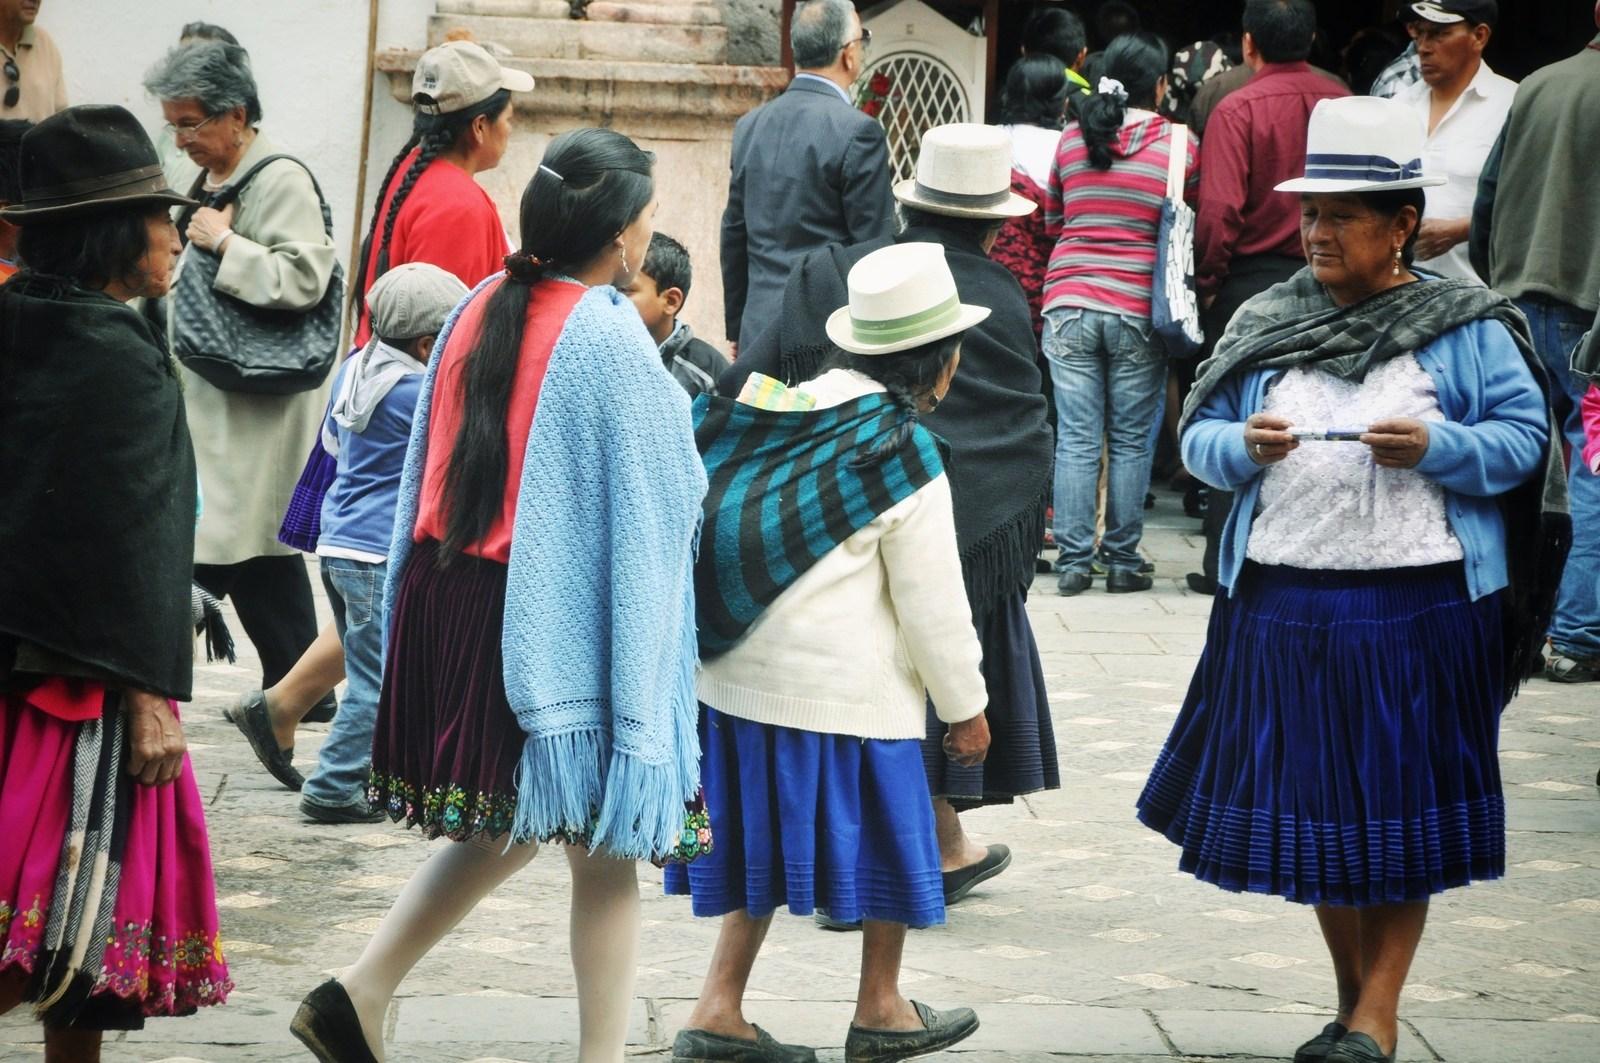 Andins à Cuenca Cuenca